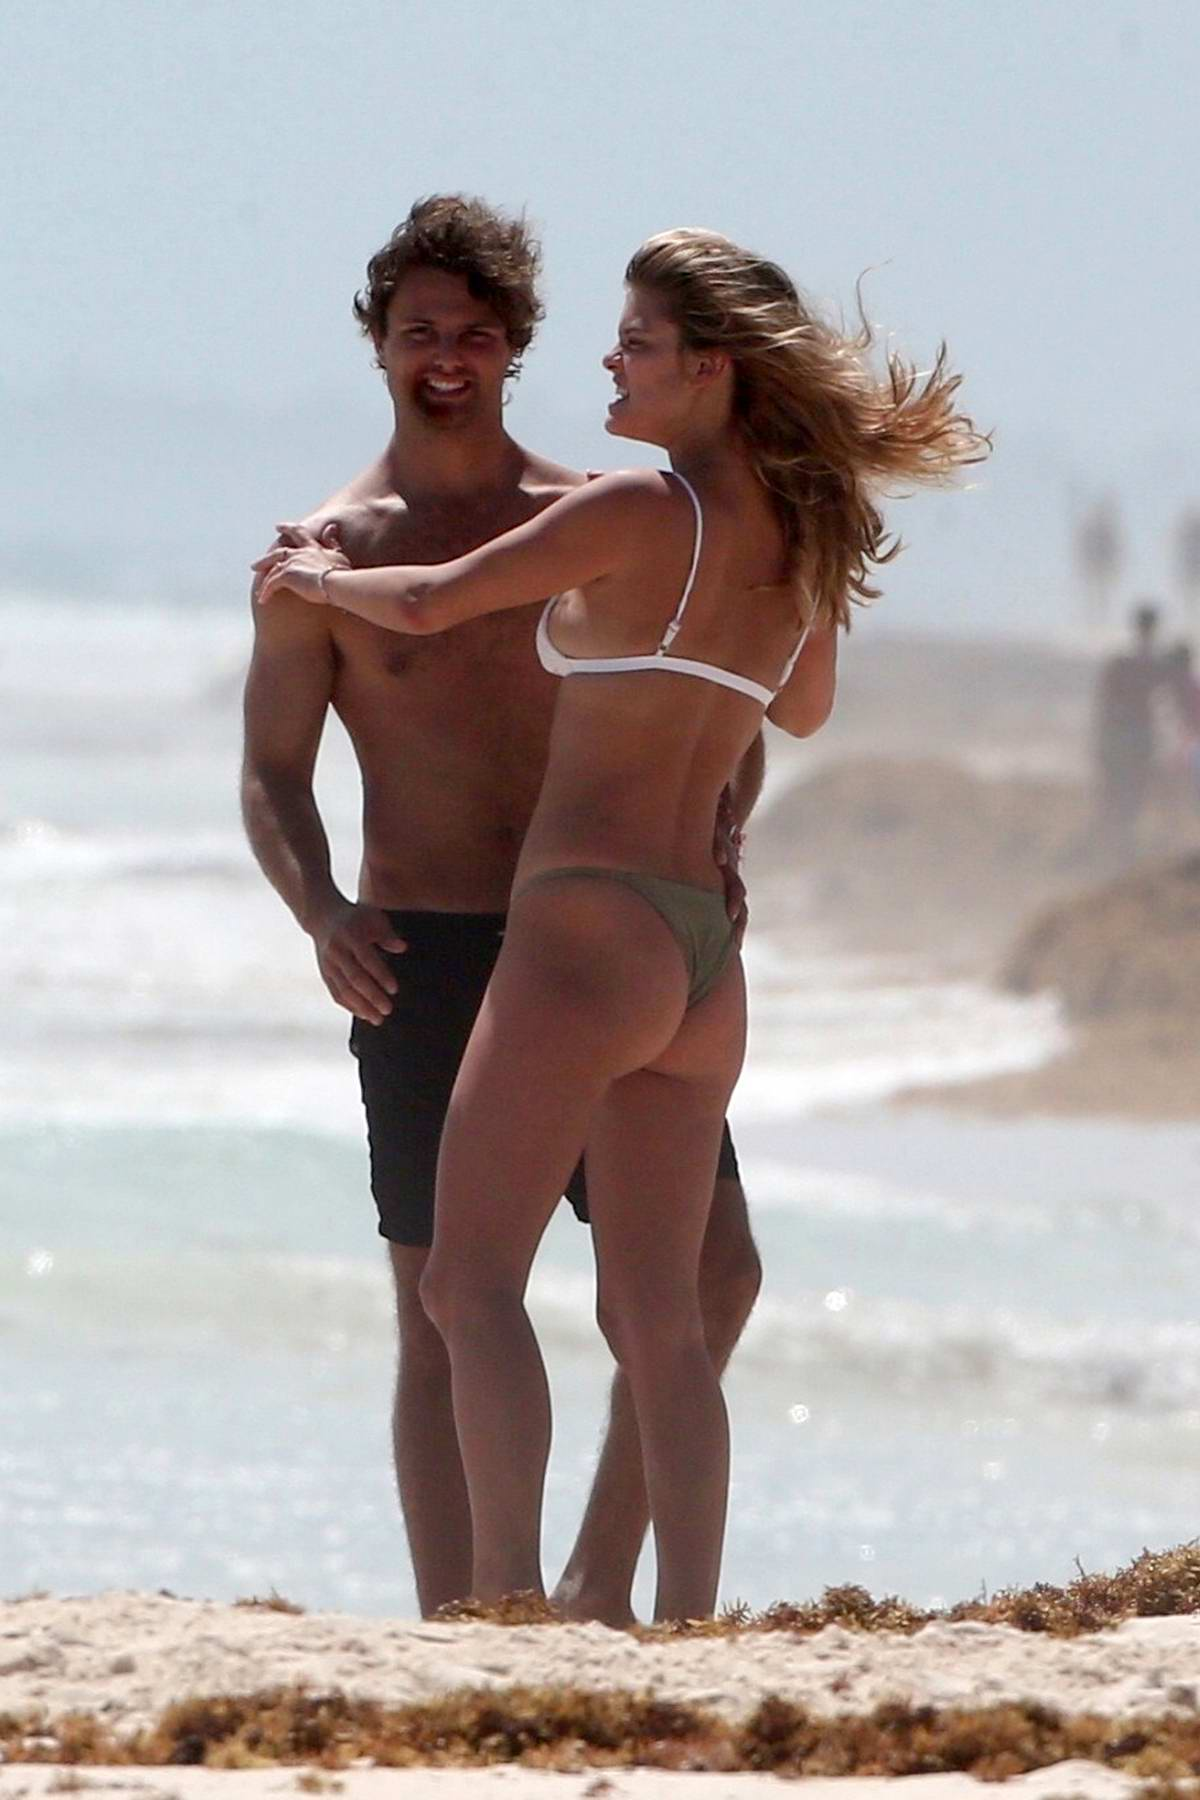 Nina Agdal wears a bikini as she enjoy the beach with boyfriend Jack Brinkley Cook in Tulum, Mexico